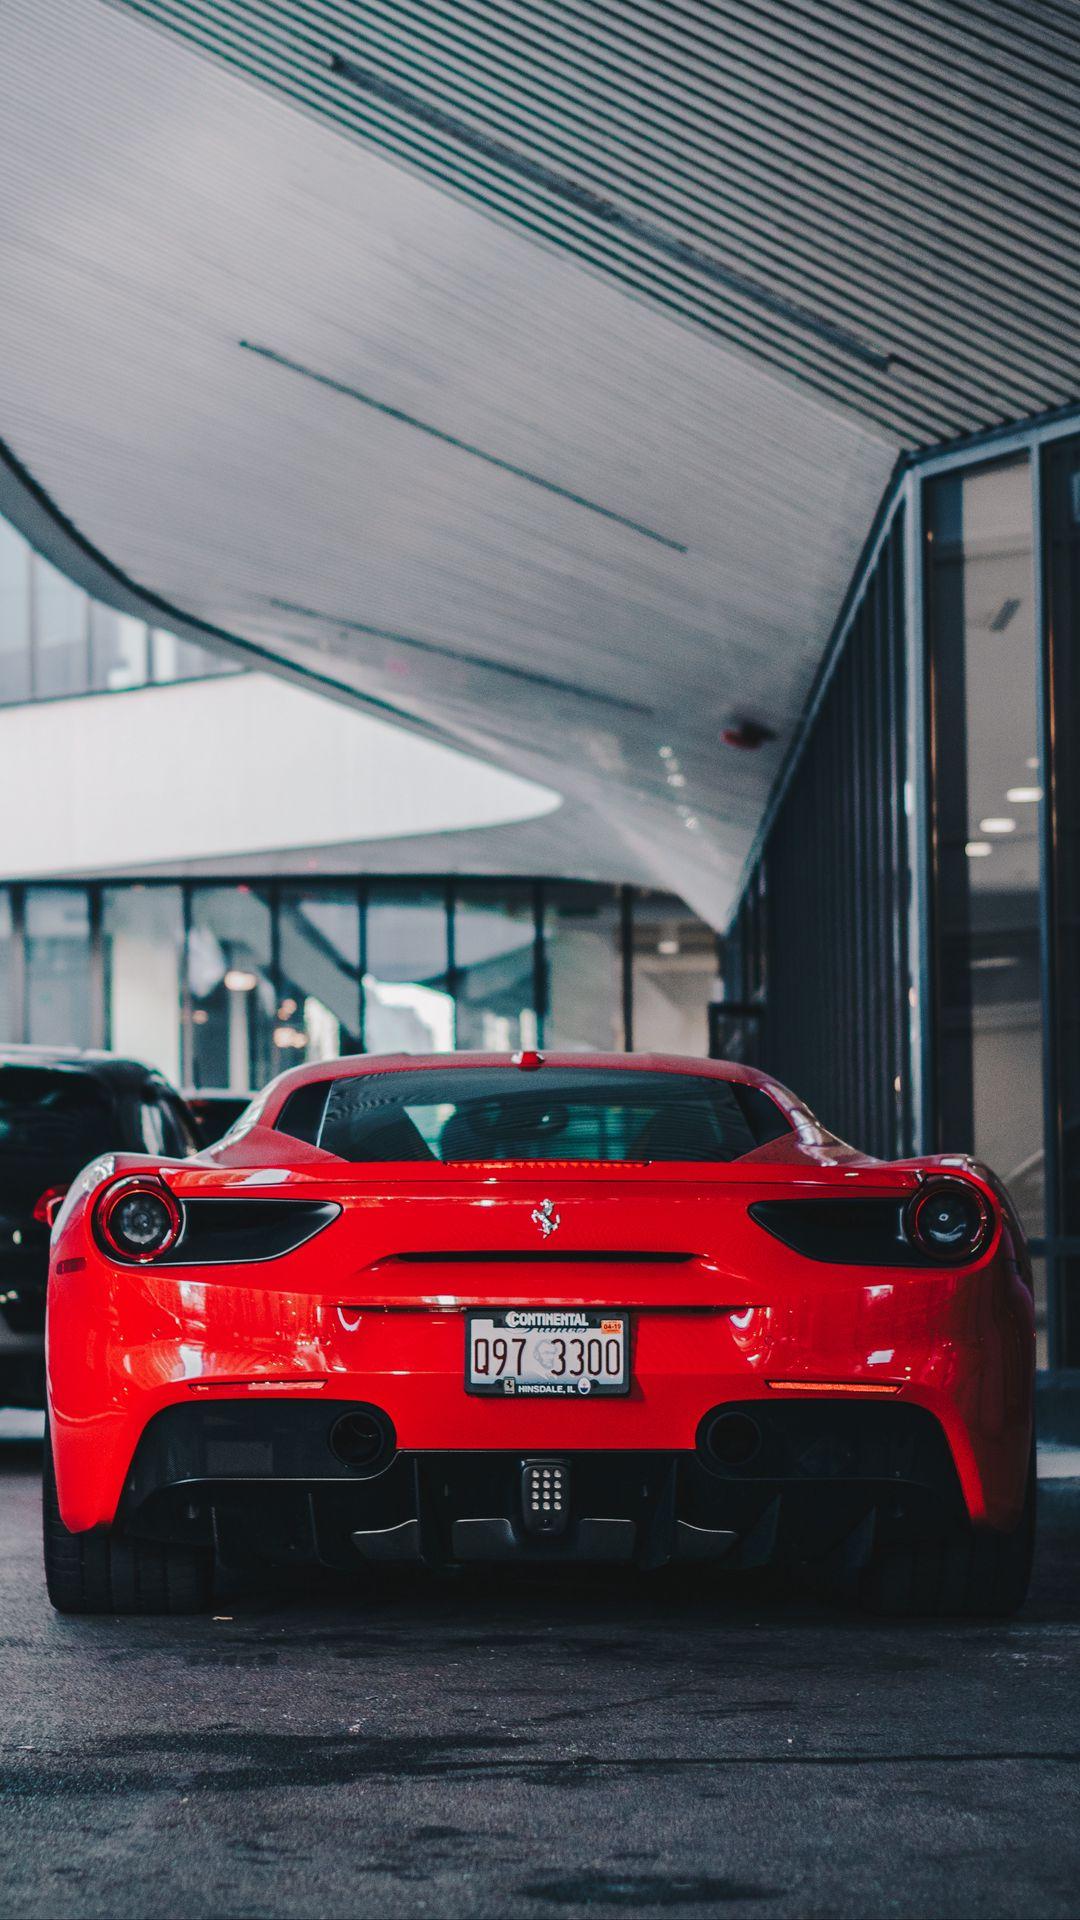 Ferrari 458 Full HD Wallpapers Free Download